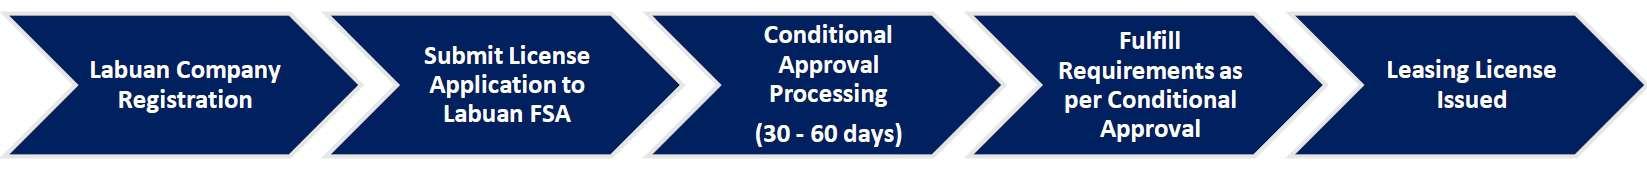 Process flow for Obtaining A Labuan Leasing Licence | QX Trust - Offshore Labuan